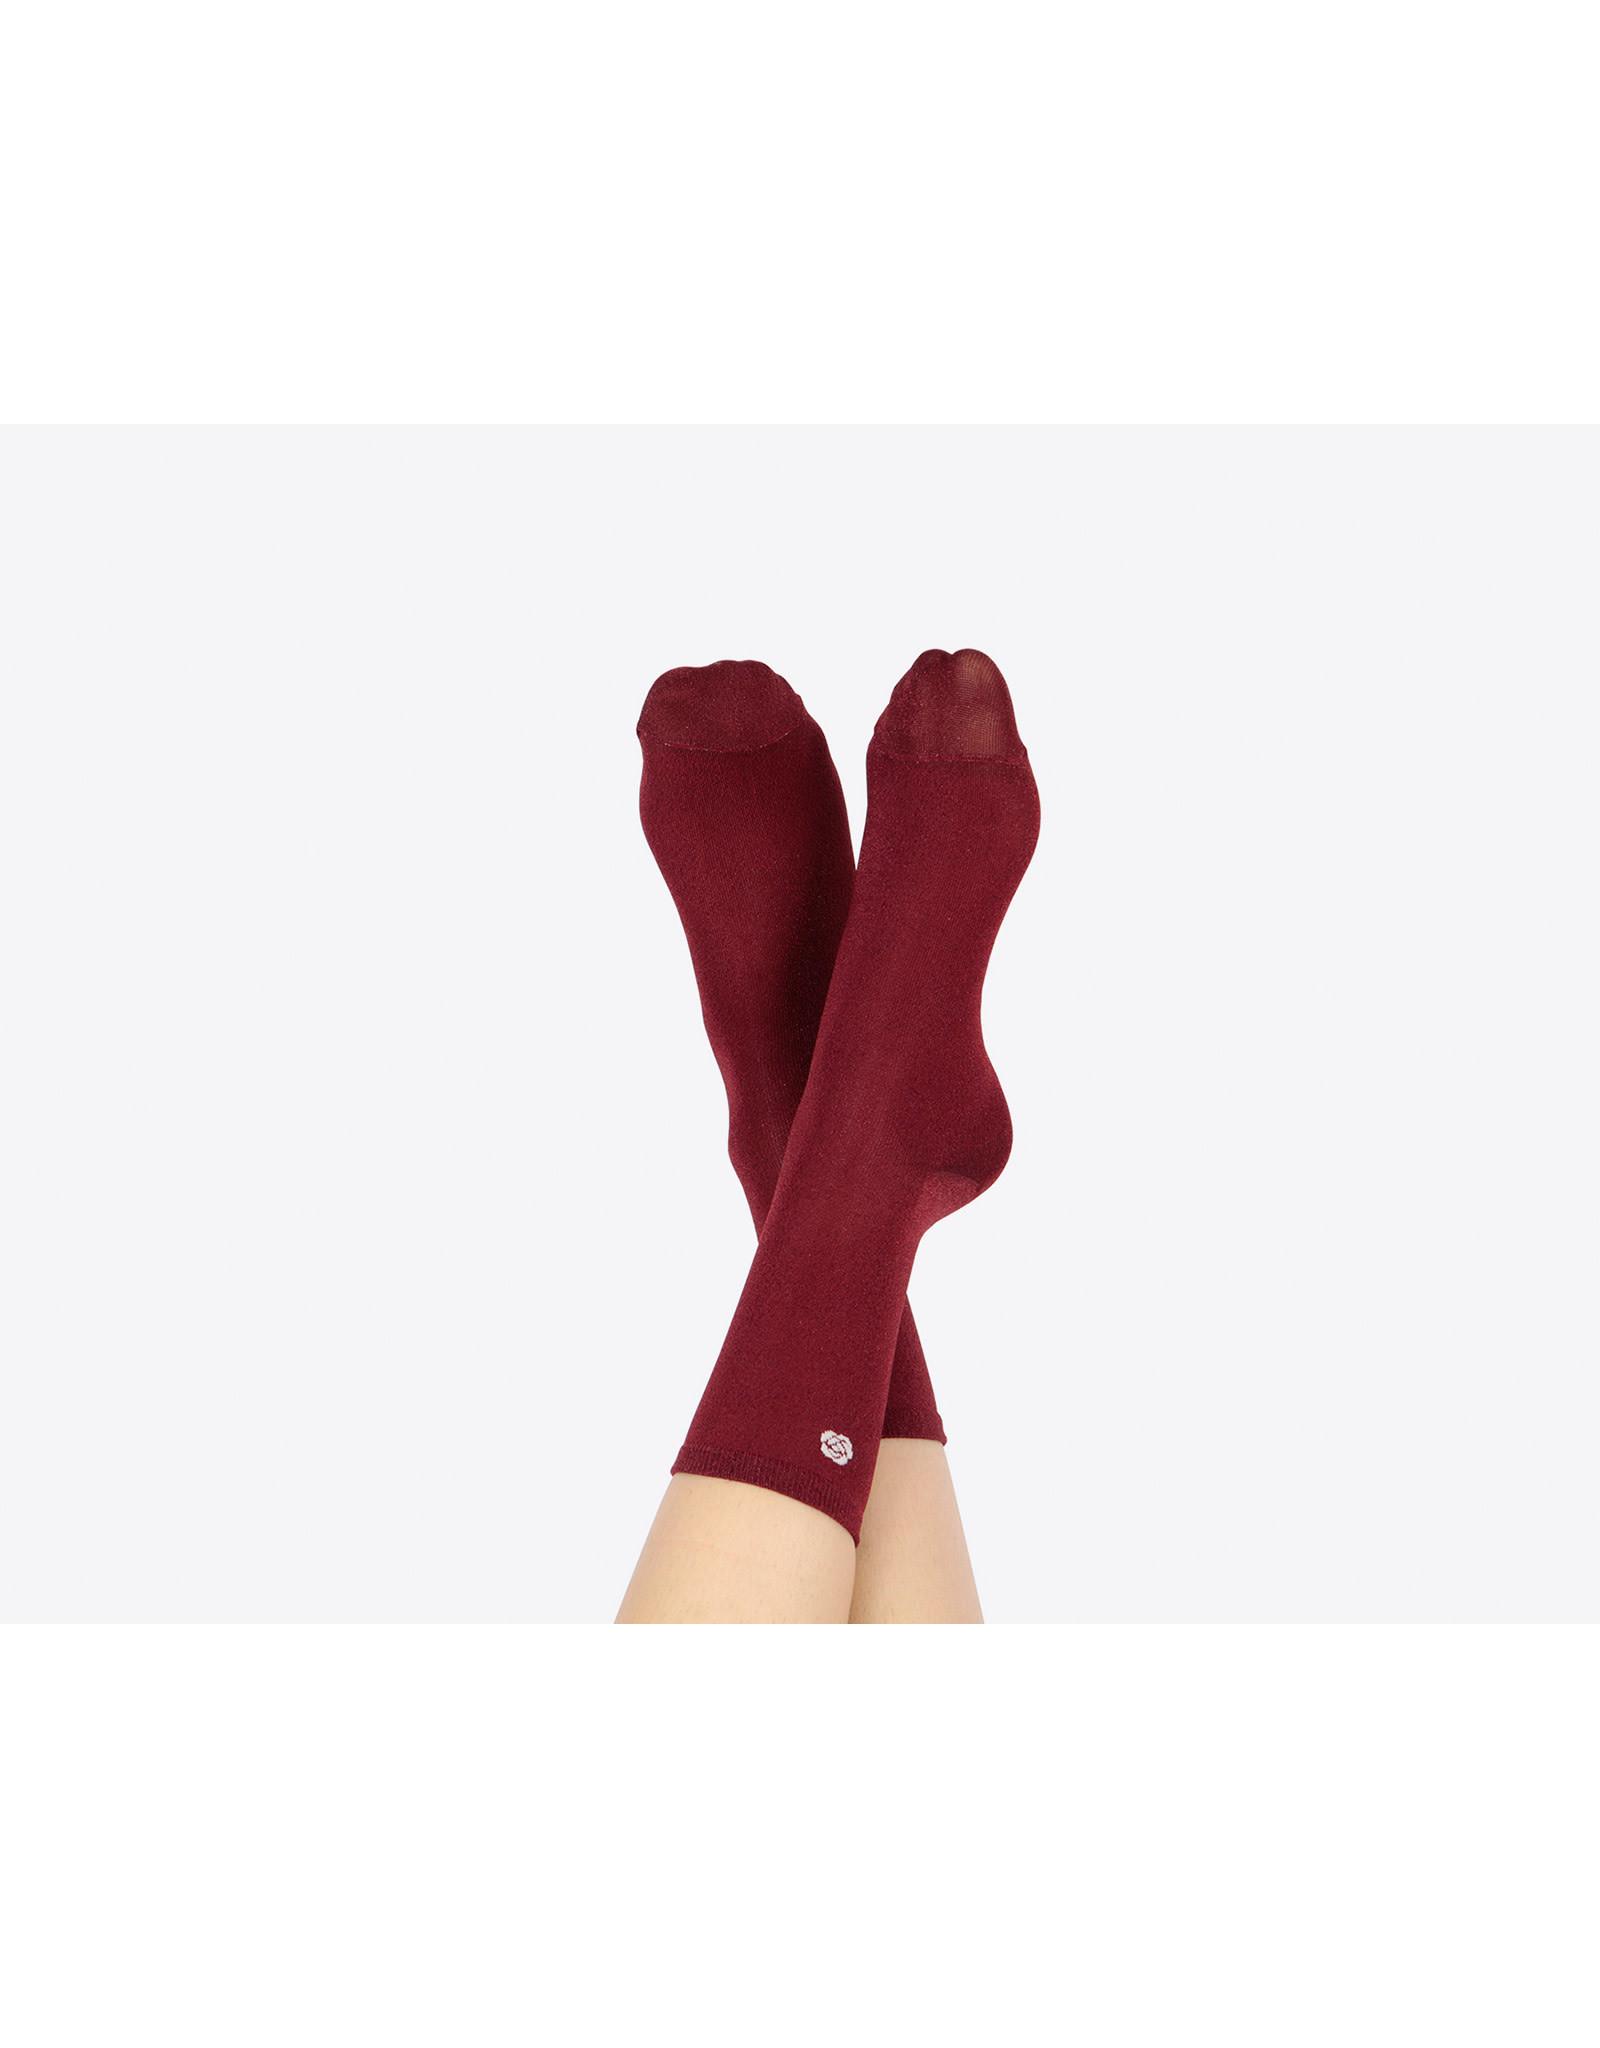 socks shaped as a rose